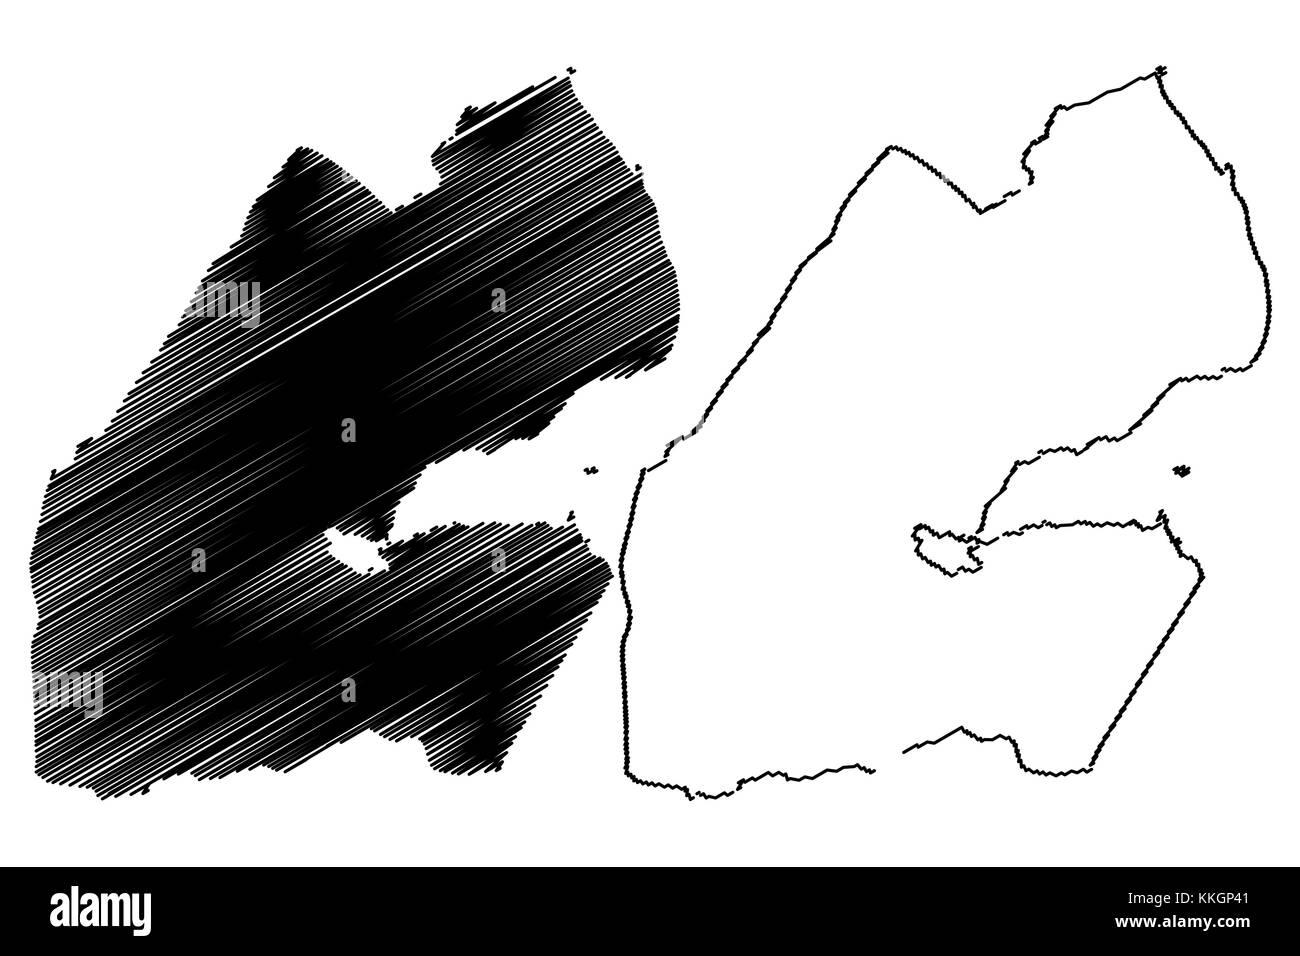 Djibouti Map Vector Illustration Scribble Sketch Republic Of - Republic of djibouti map